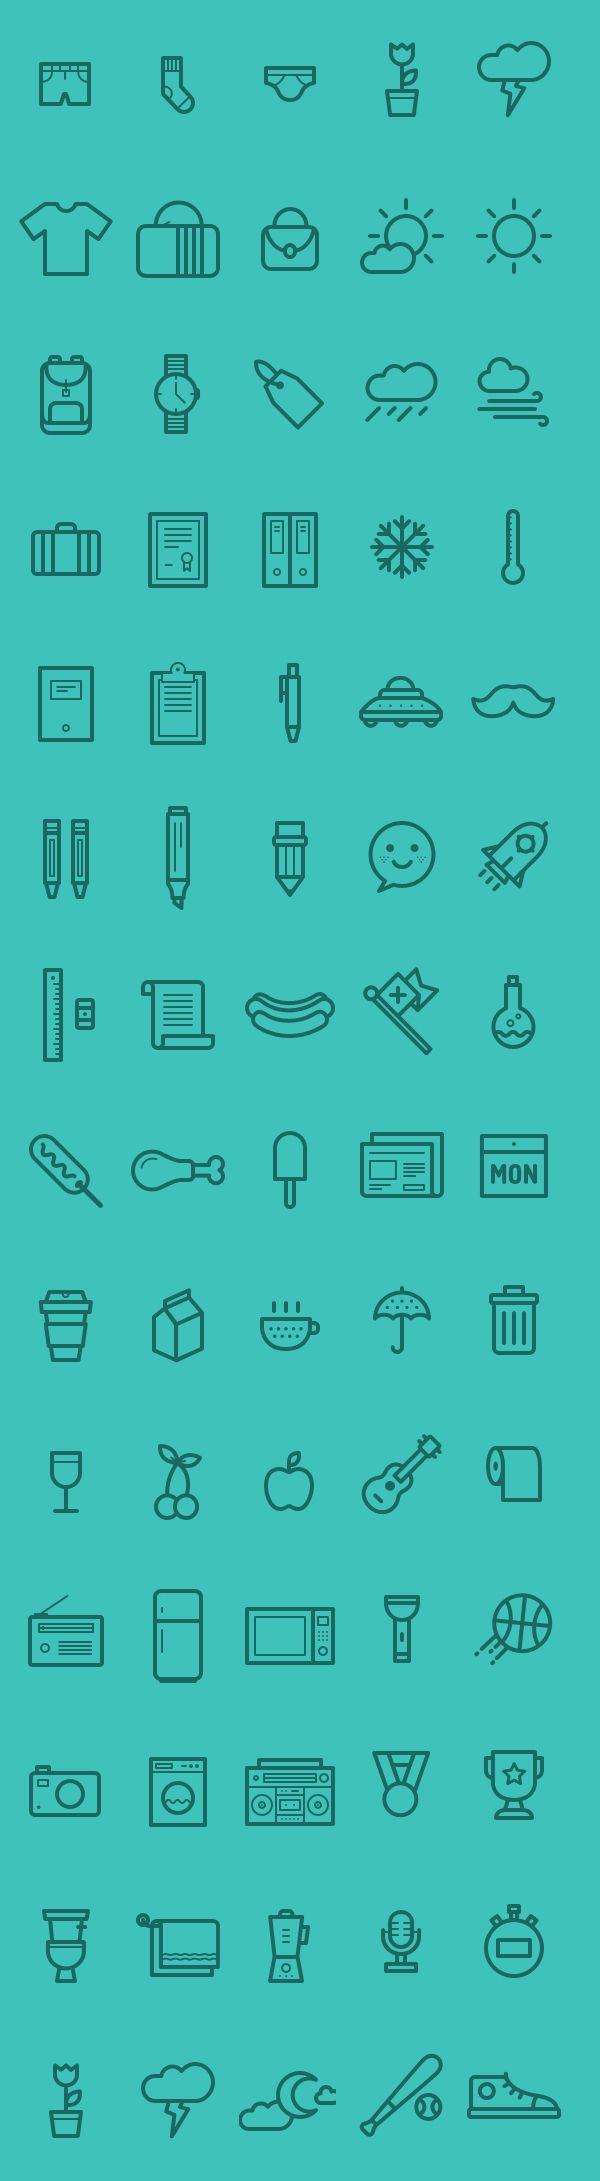 Medlee Iconset - AI EPS & PSD (80 Icons)